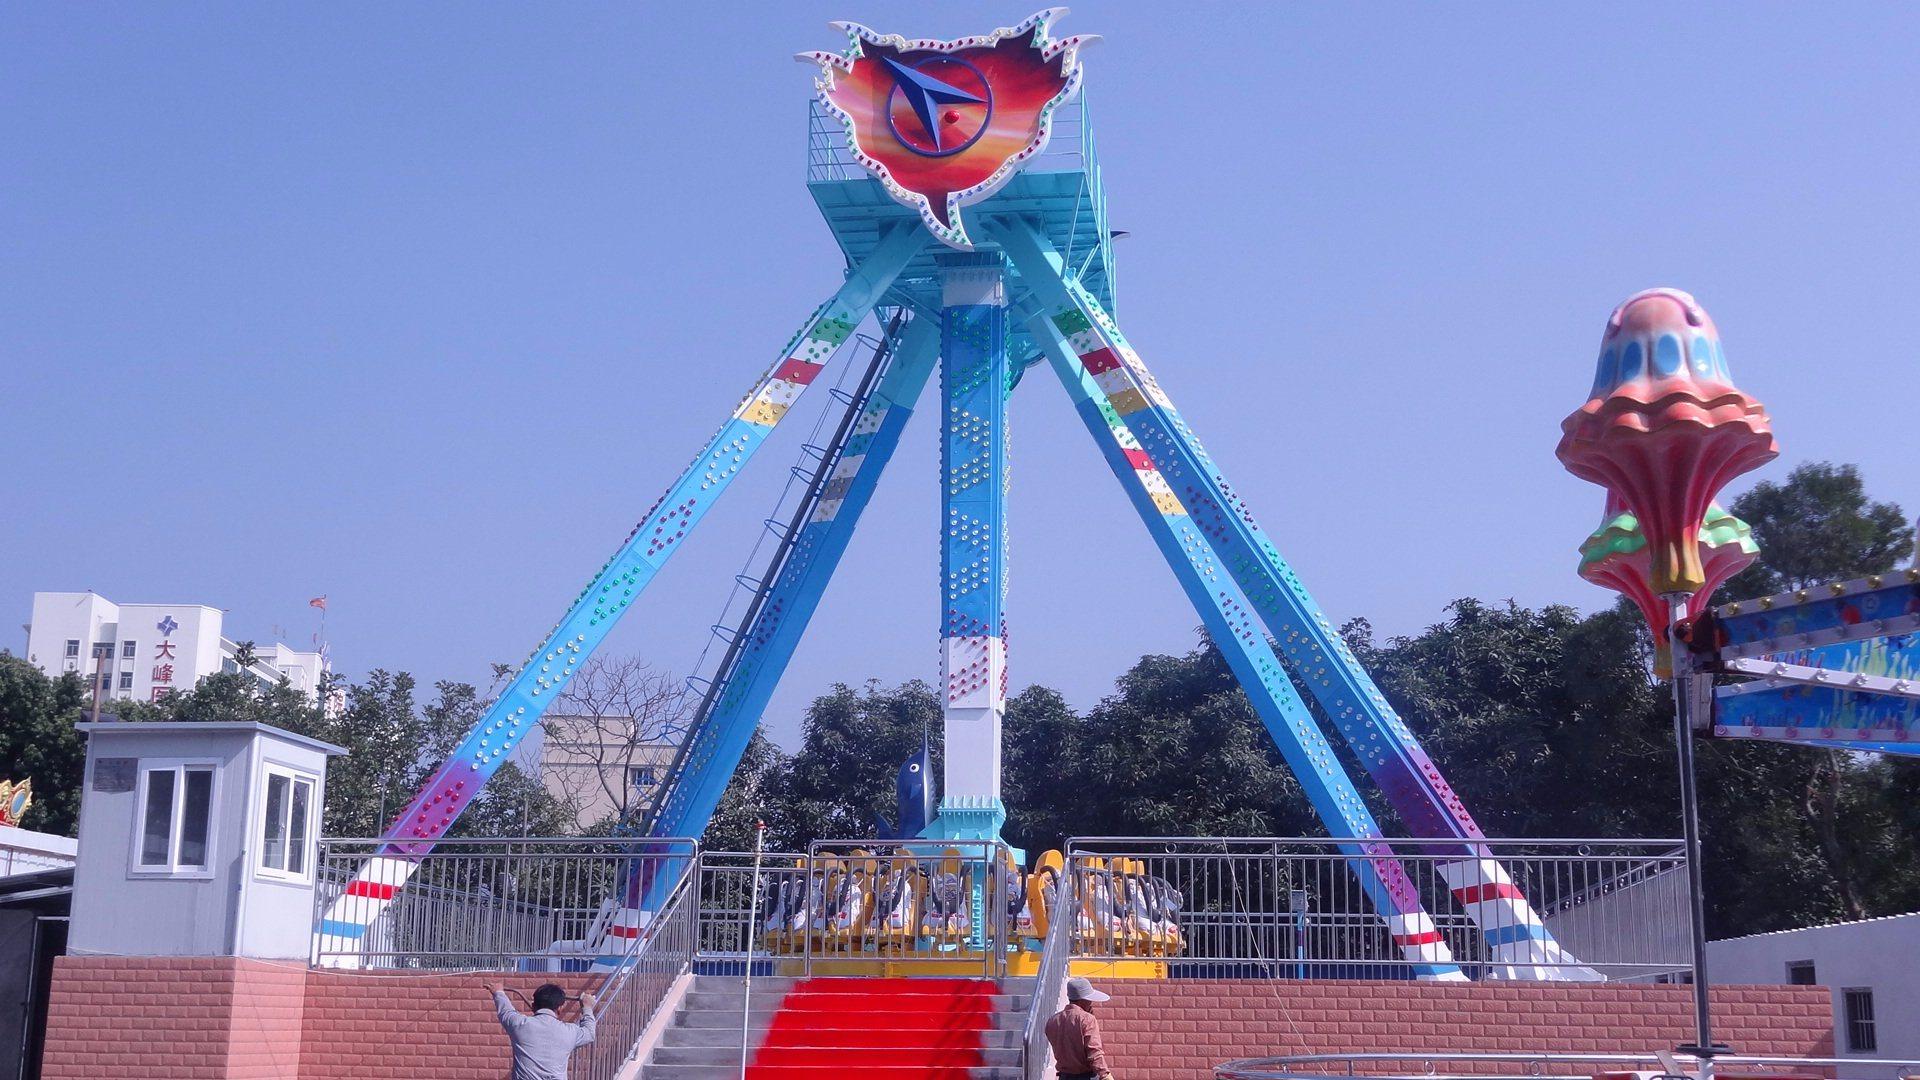 22 Seats Big Pendulum 2016 New Design Amusement Park Rides